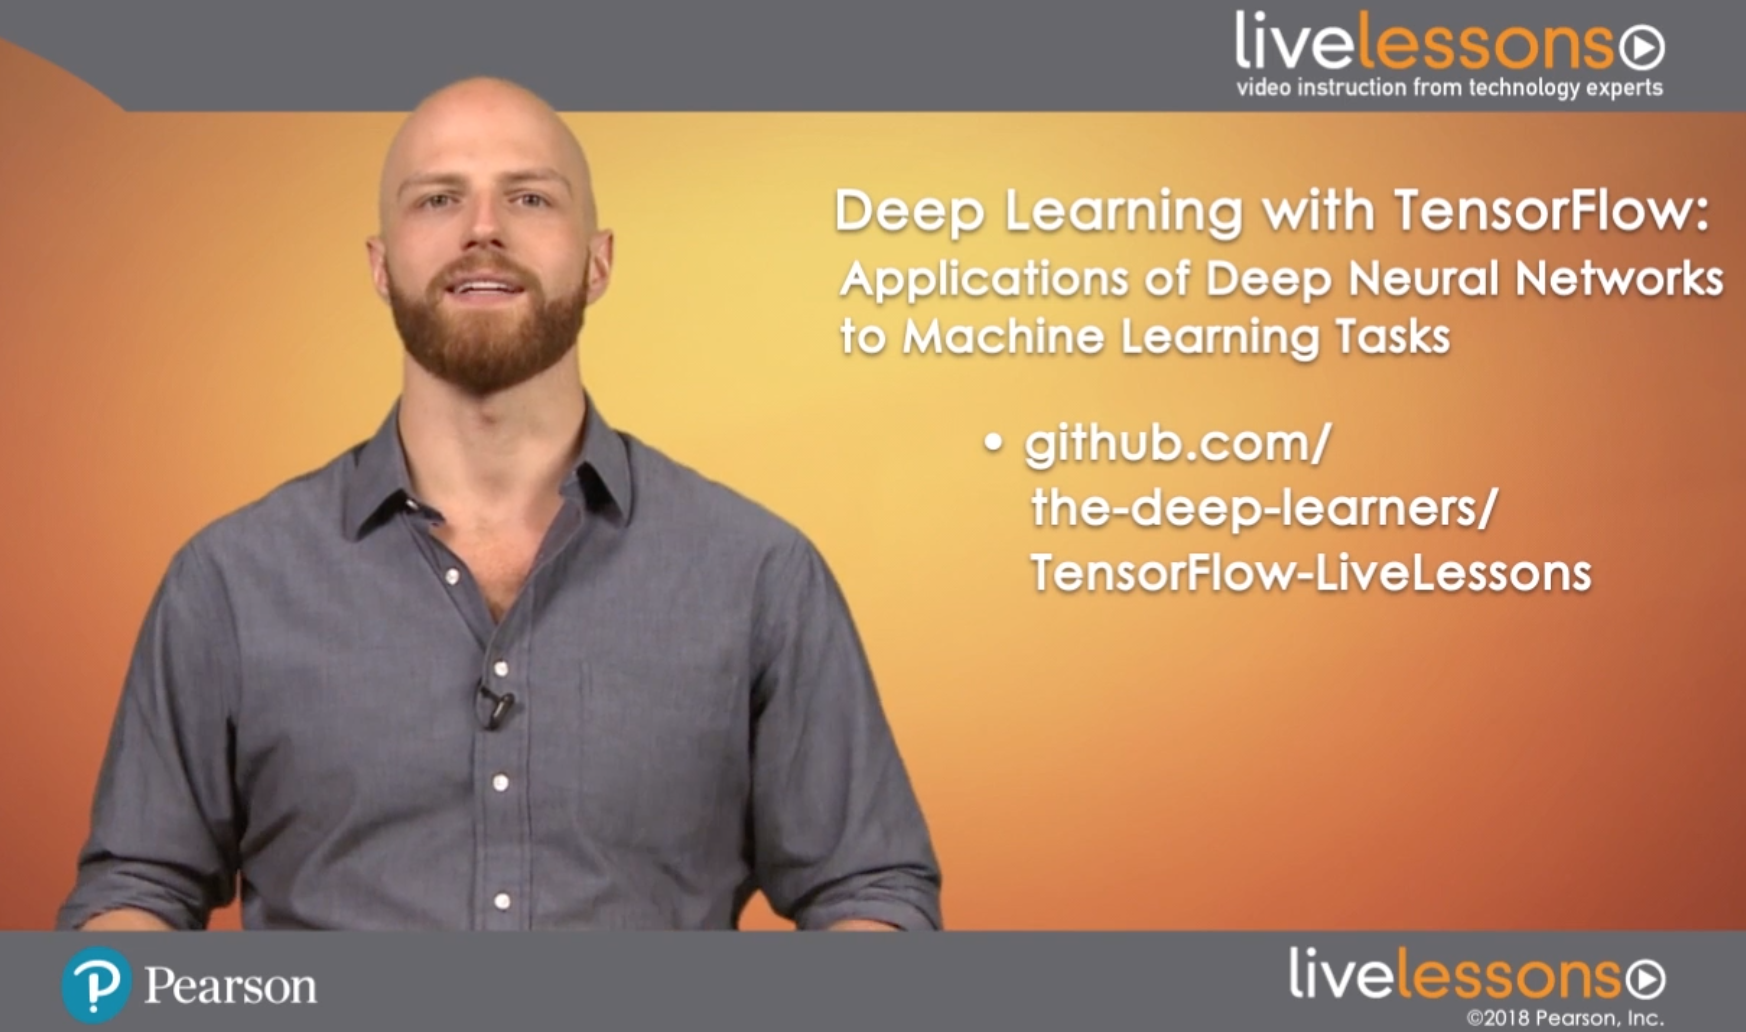 jon_krohn_deep_learning_with_tensorflow_livelessons.png